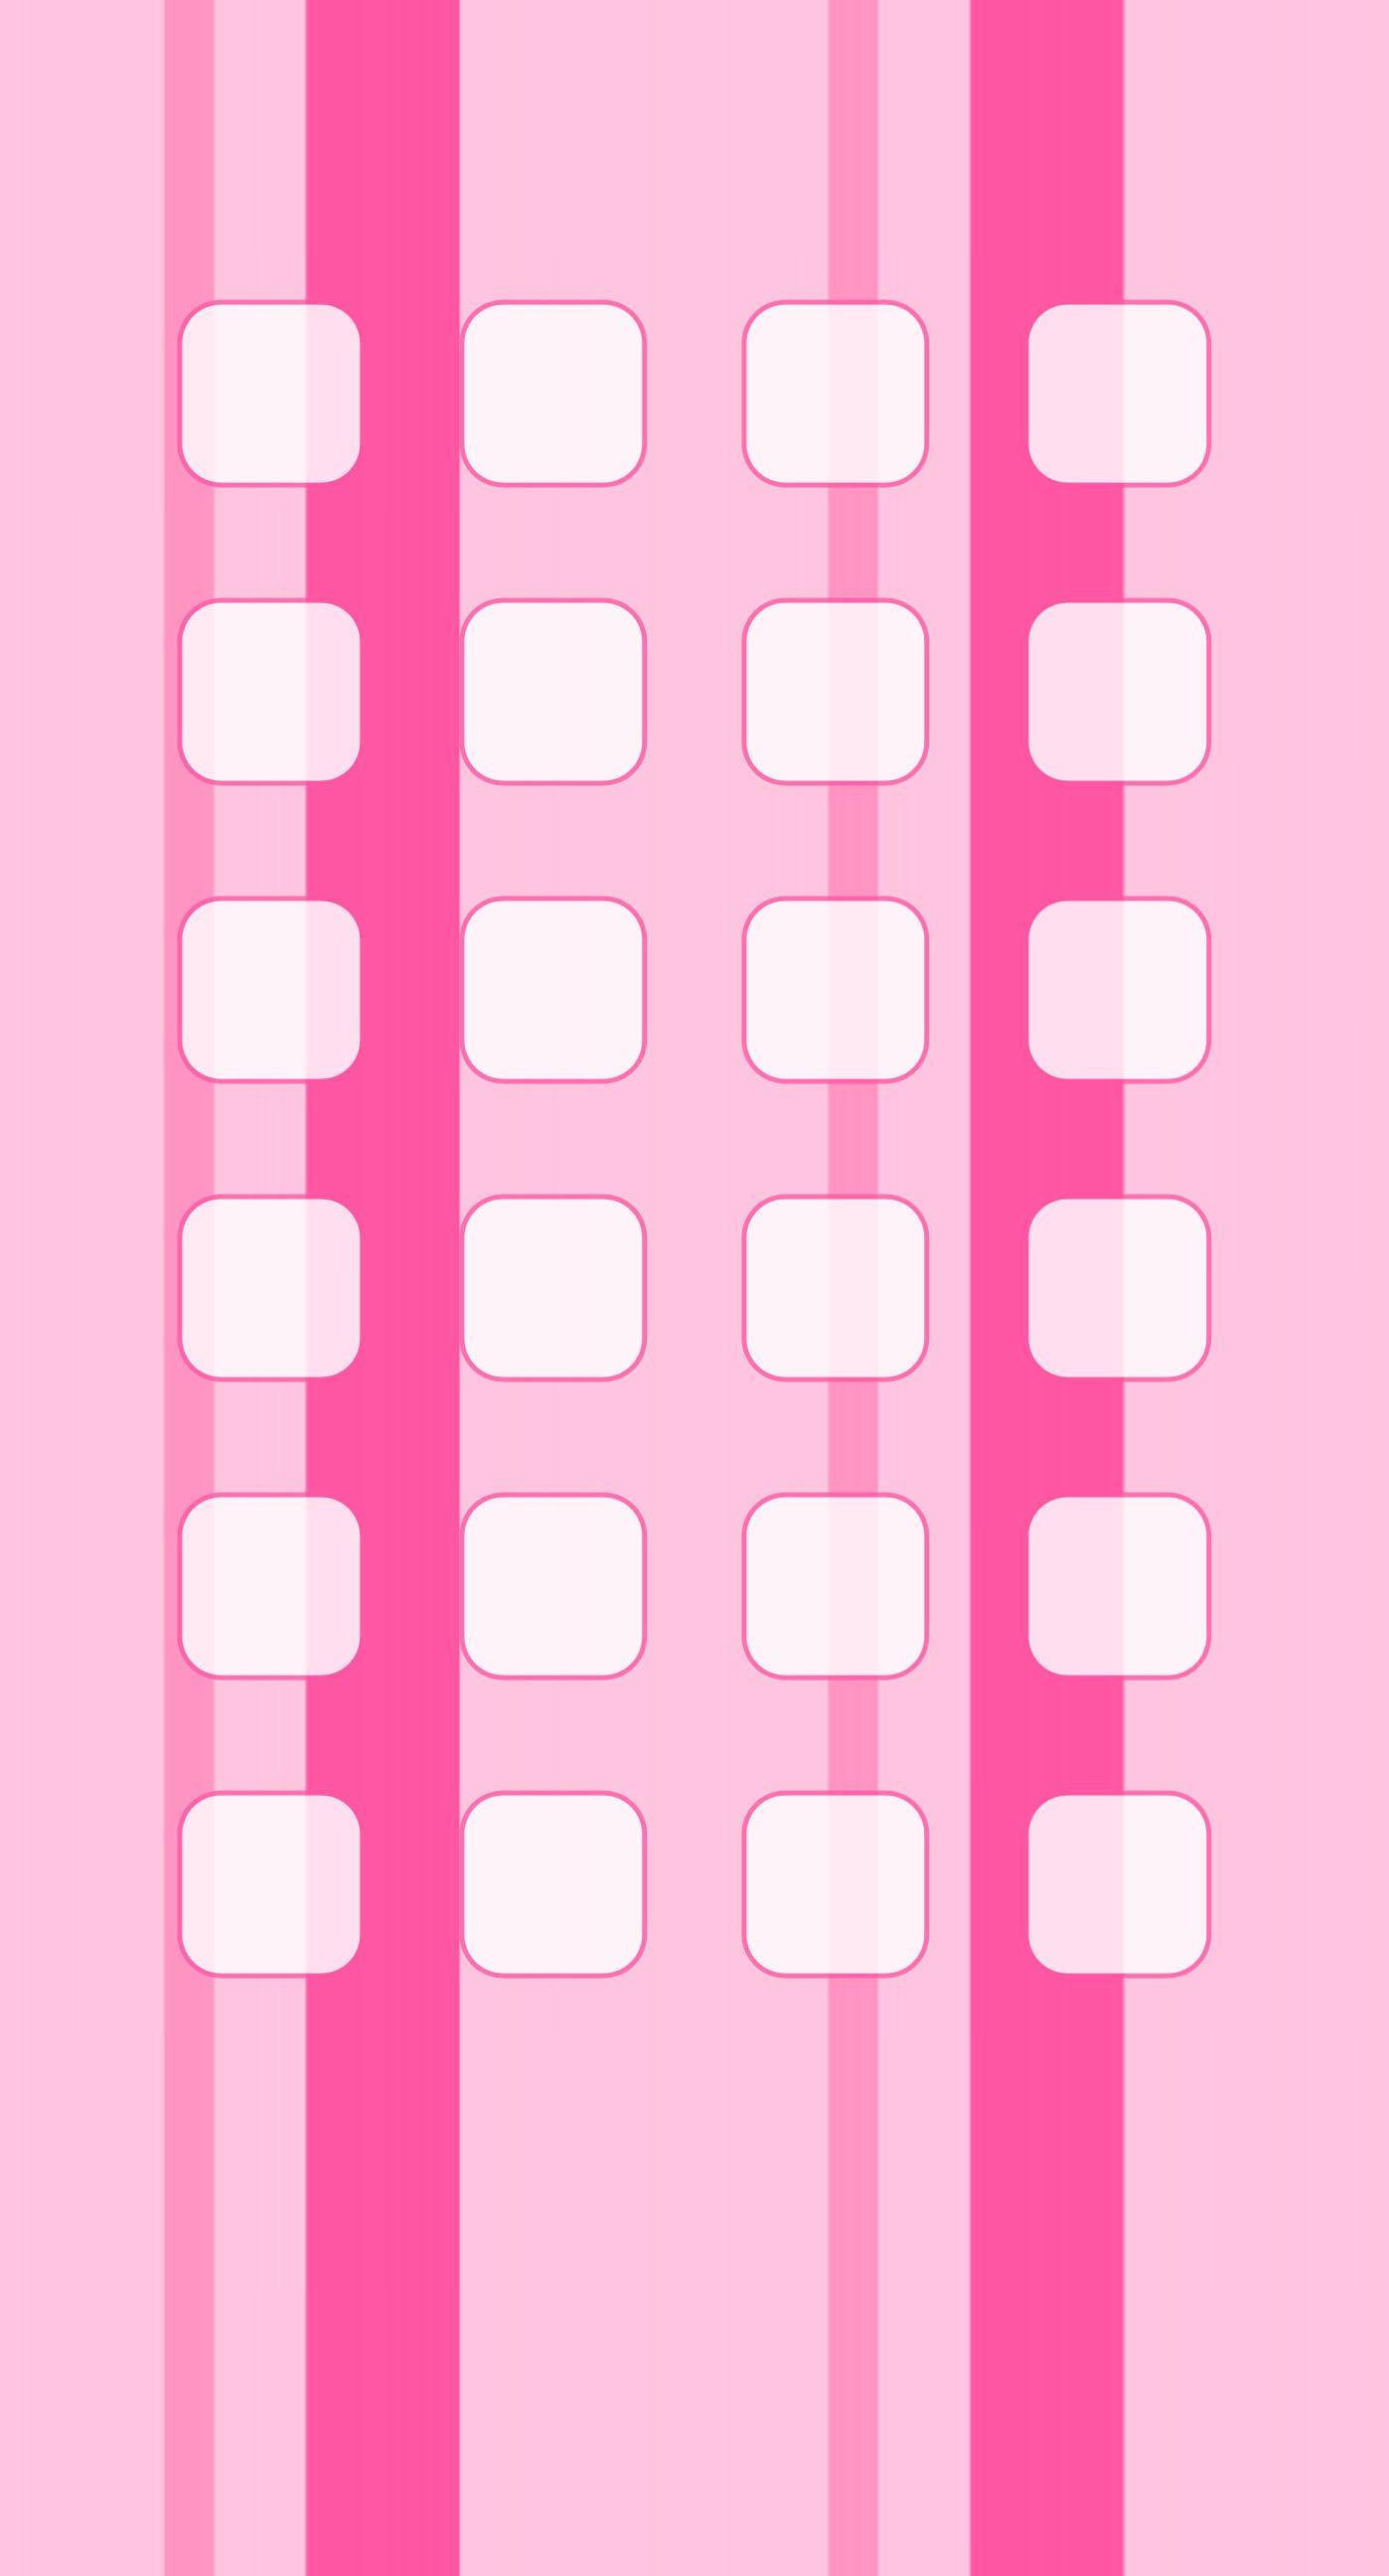 pattern border shelf pink wallpaper sc iphone6splusiphone 6s plus iphone 6 plus wallpaper